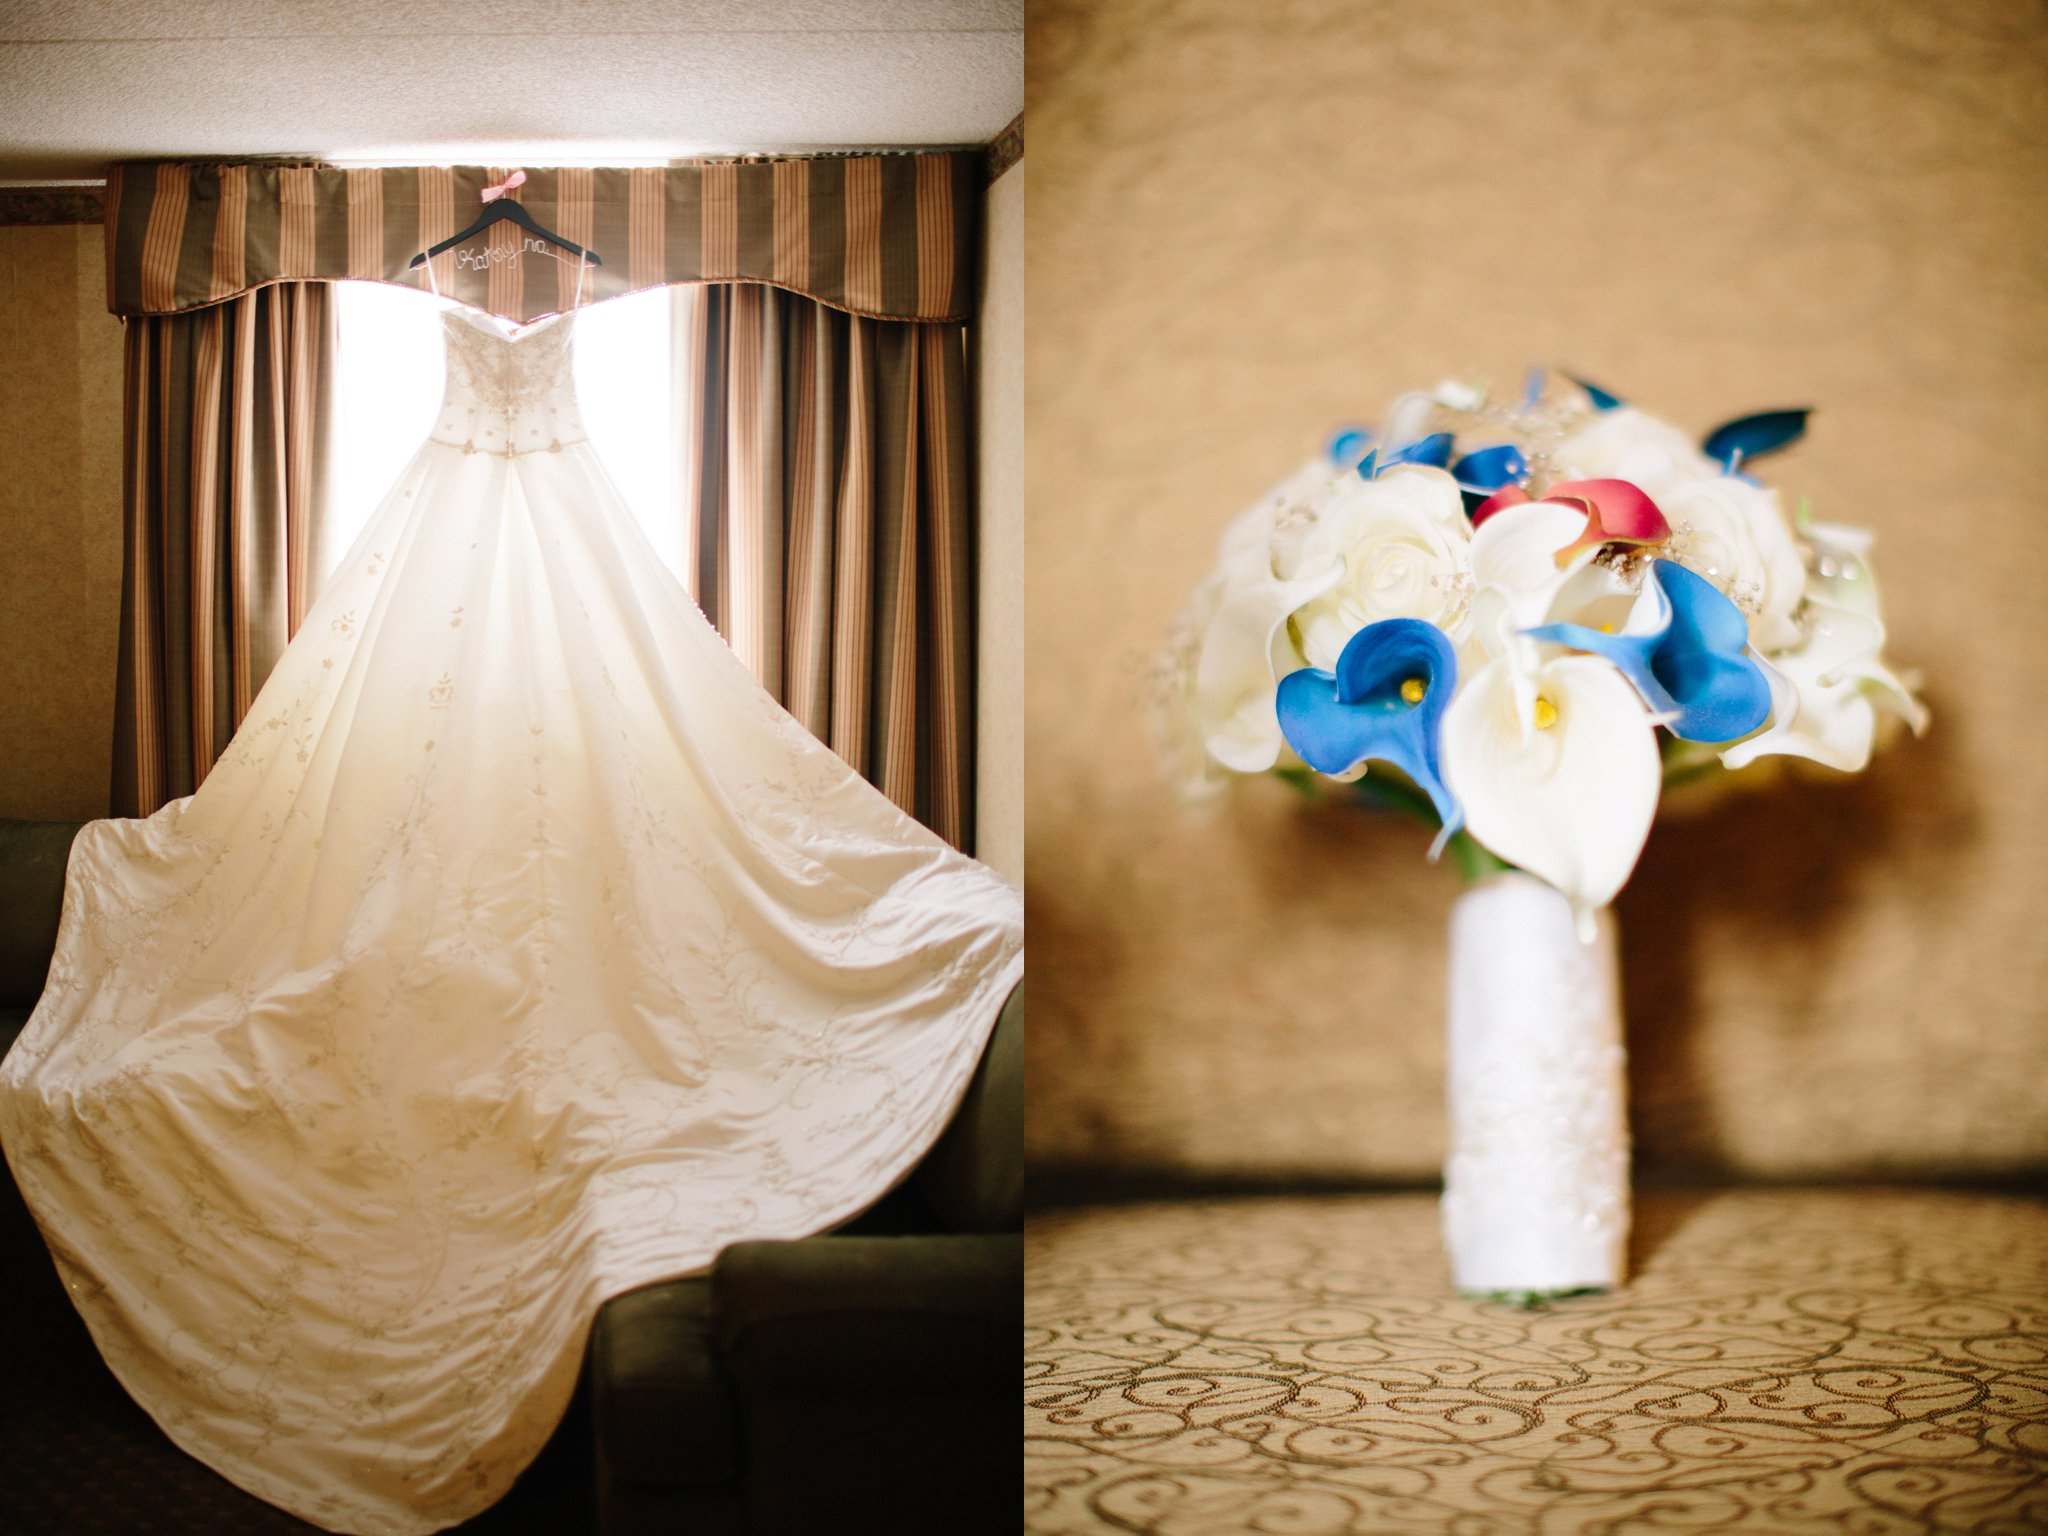 genettis_wilkes_barre_wedding_photos_8300.jpg